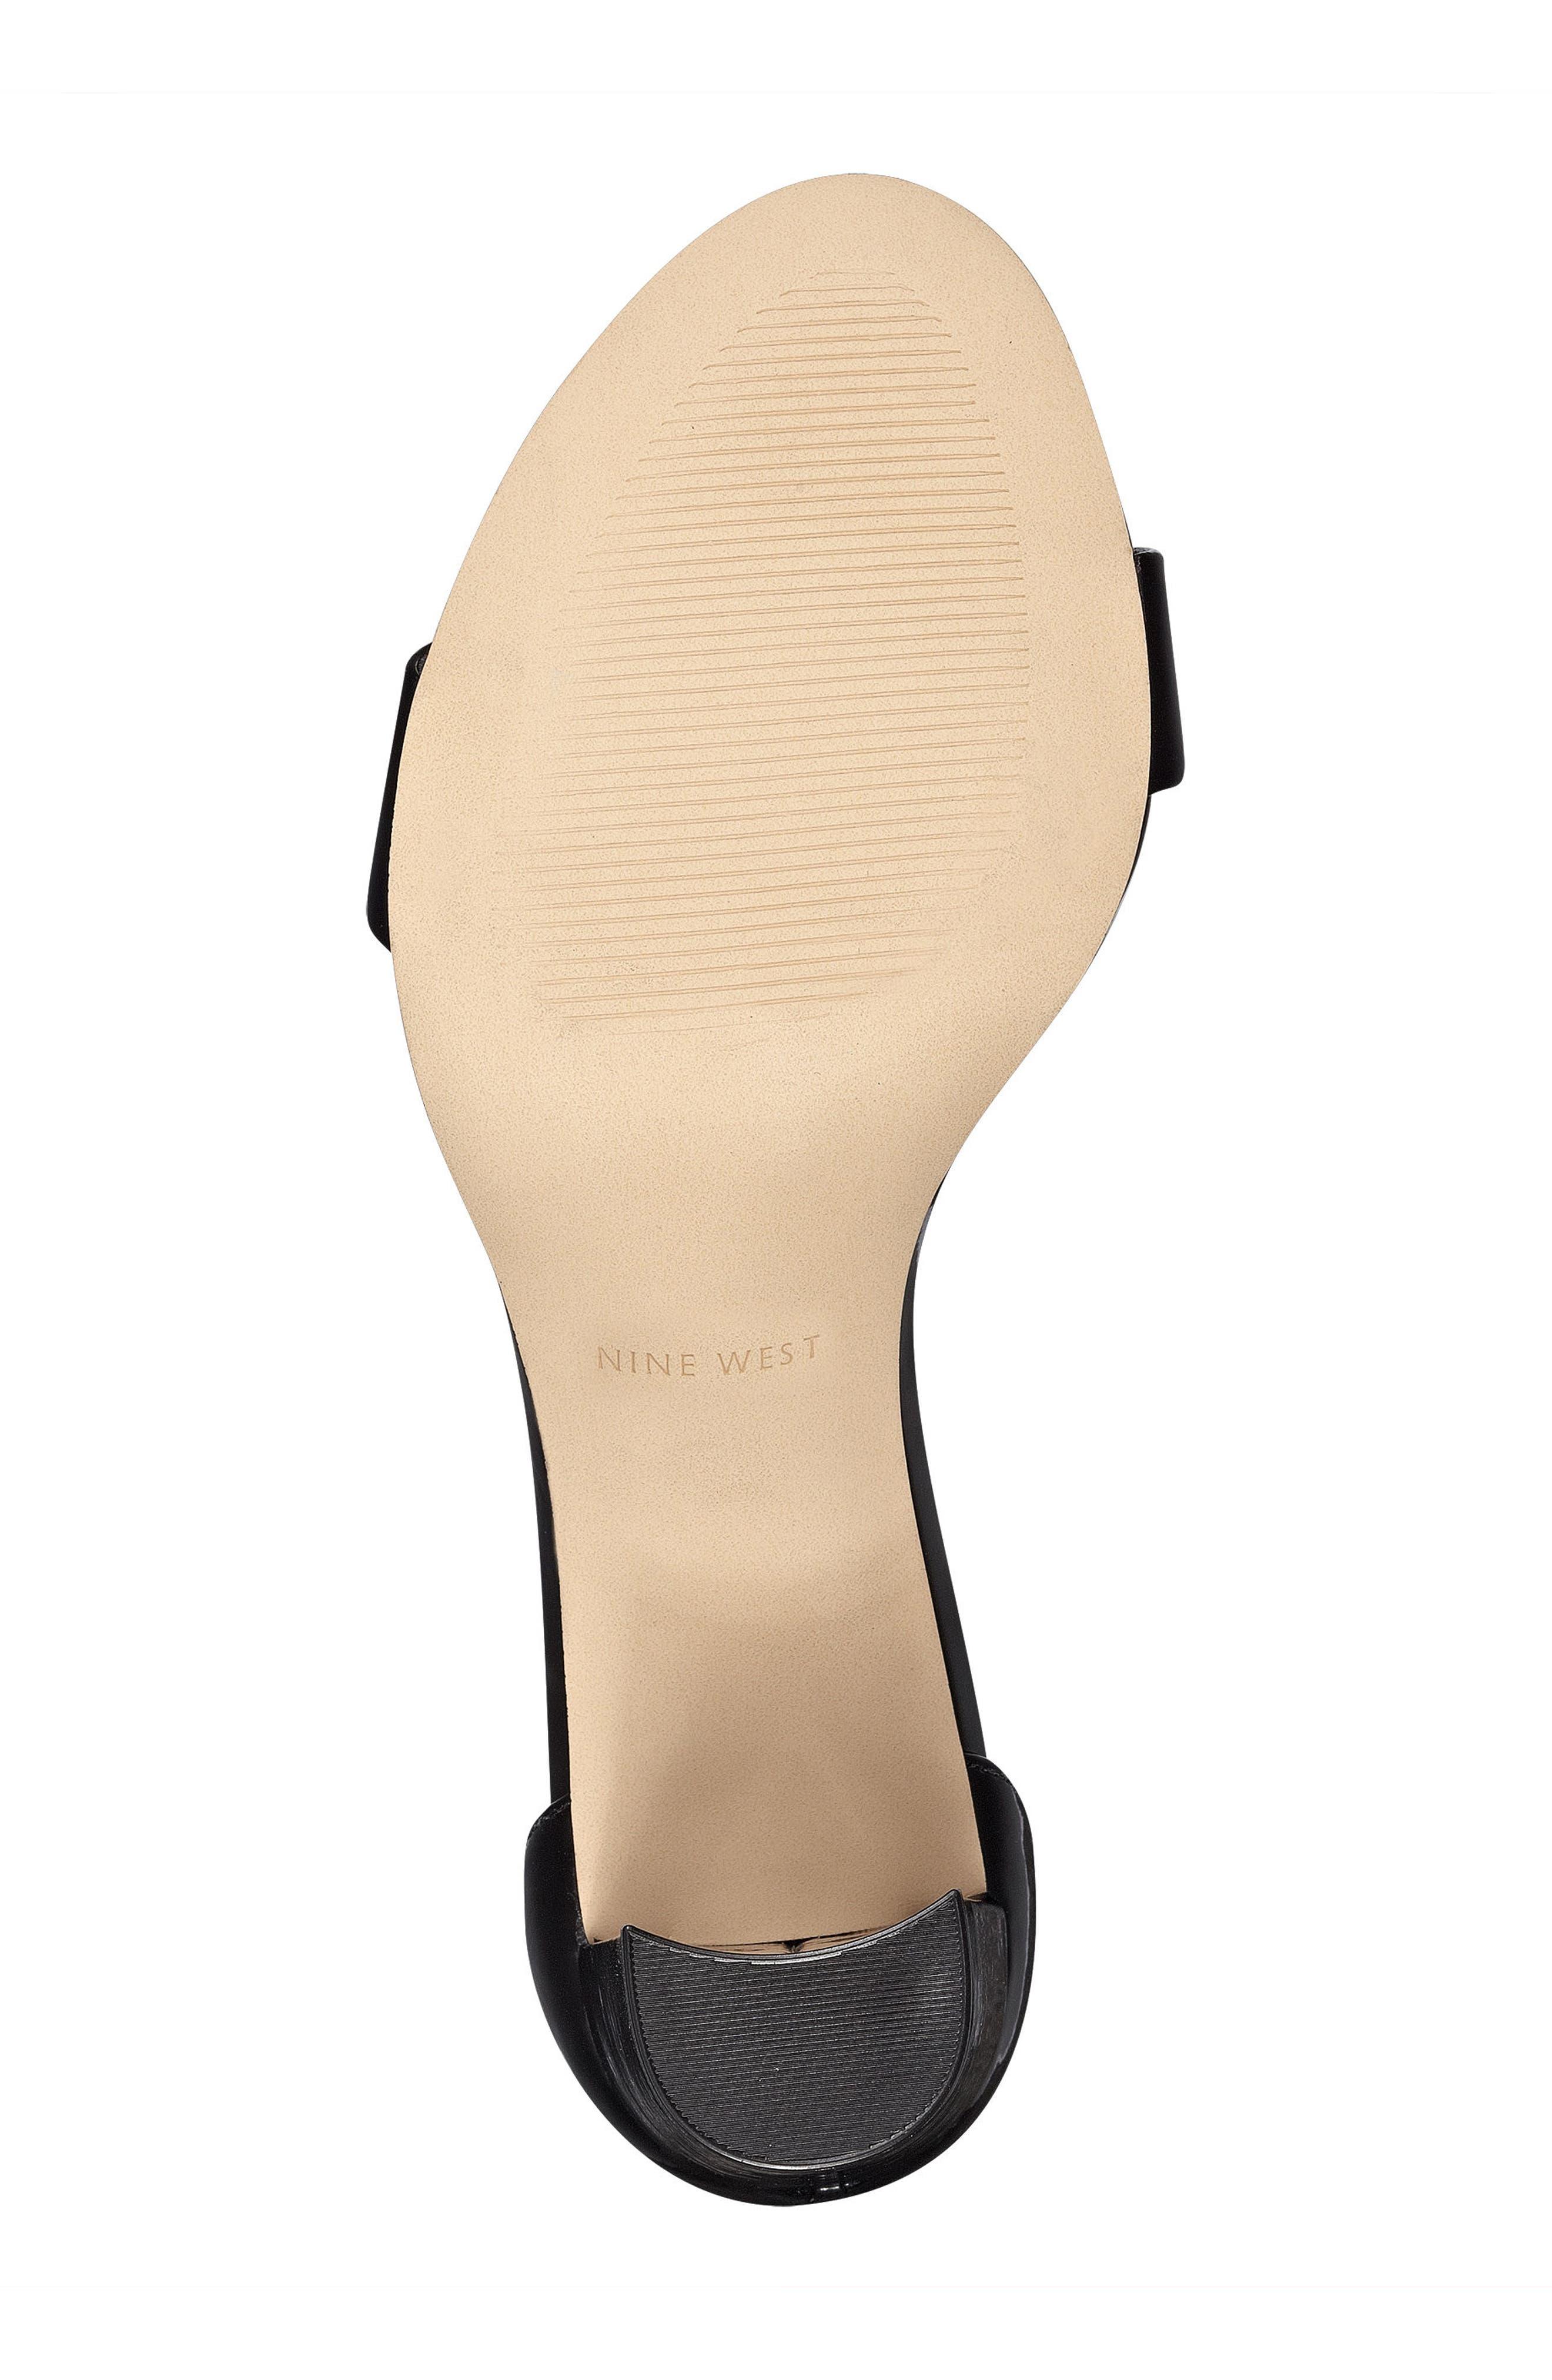 NINE WEST, Pruce Ankle Strap Sandal, Alternate thumbnail 6, color, BLACK PATENT